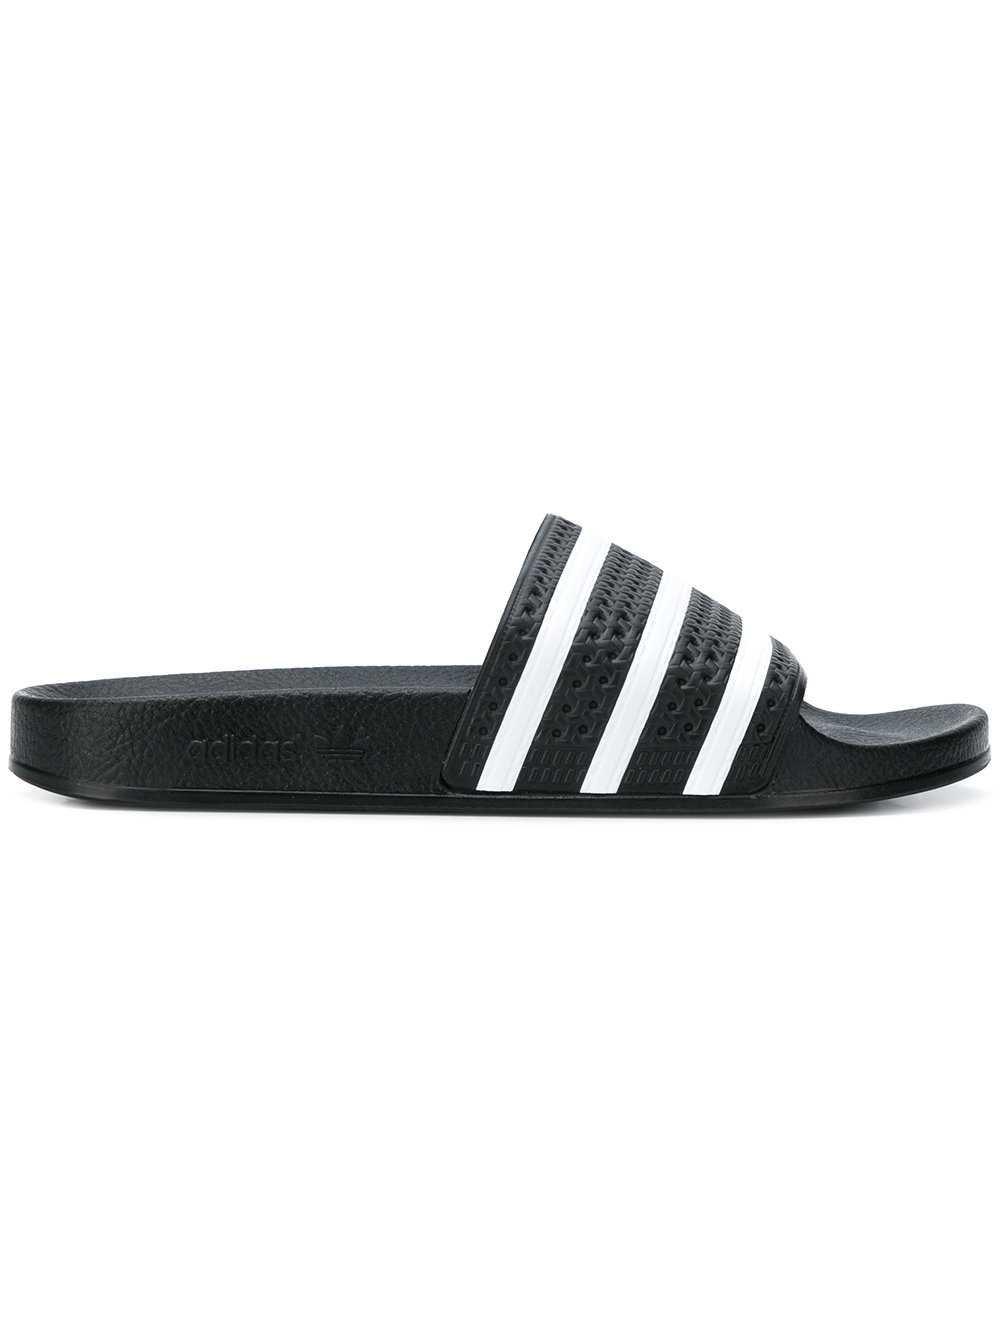 Adidas Striped Pool Slides - Farfetch